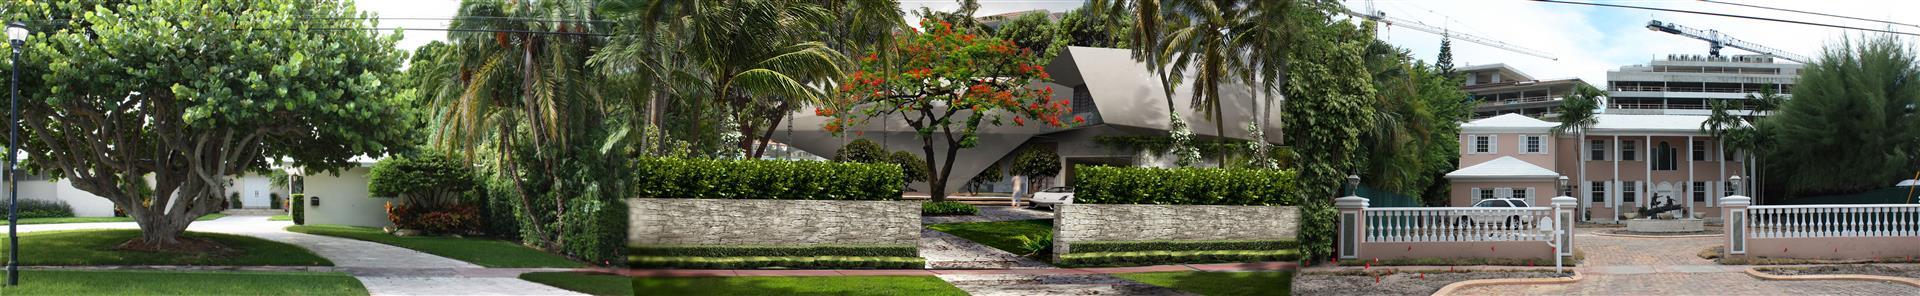 790 Lakeview Drive Miami Beach Harvey Hernandez